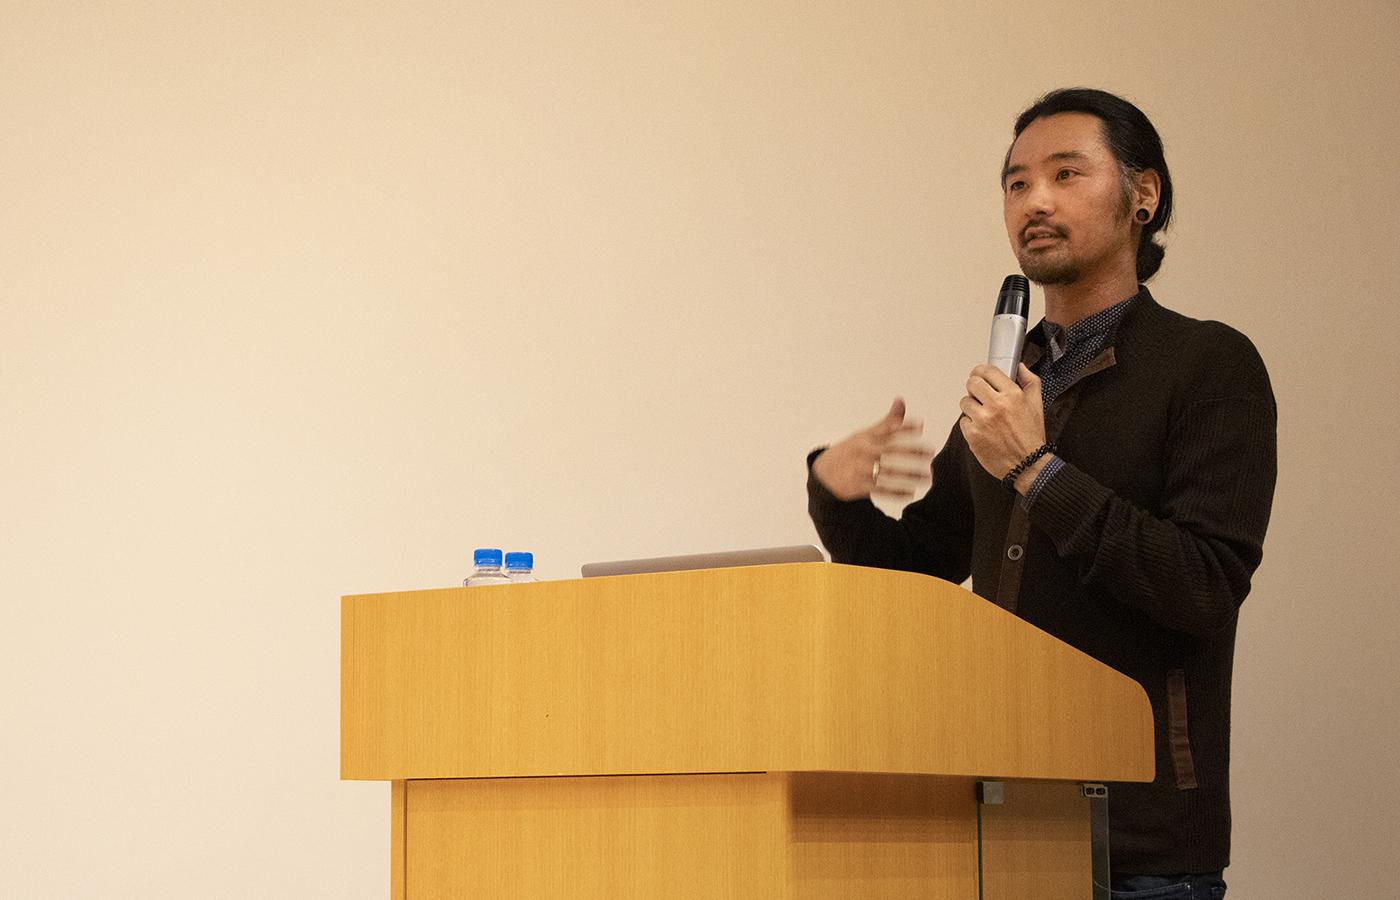 Keisuke Suzuki from the University of Sussex at the podium